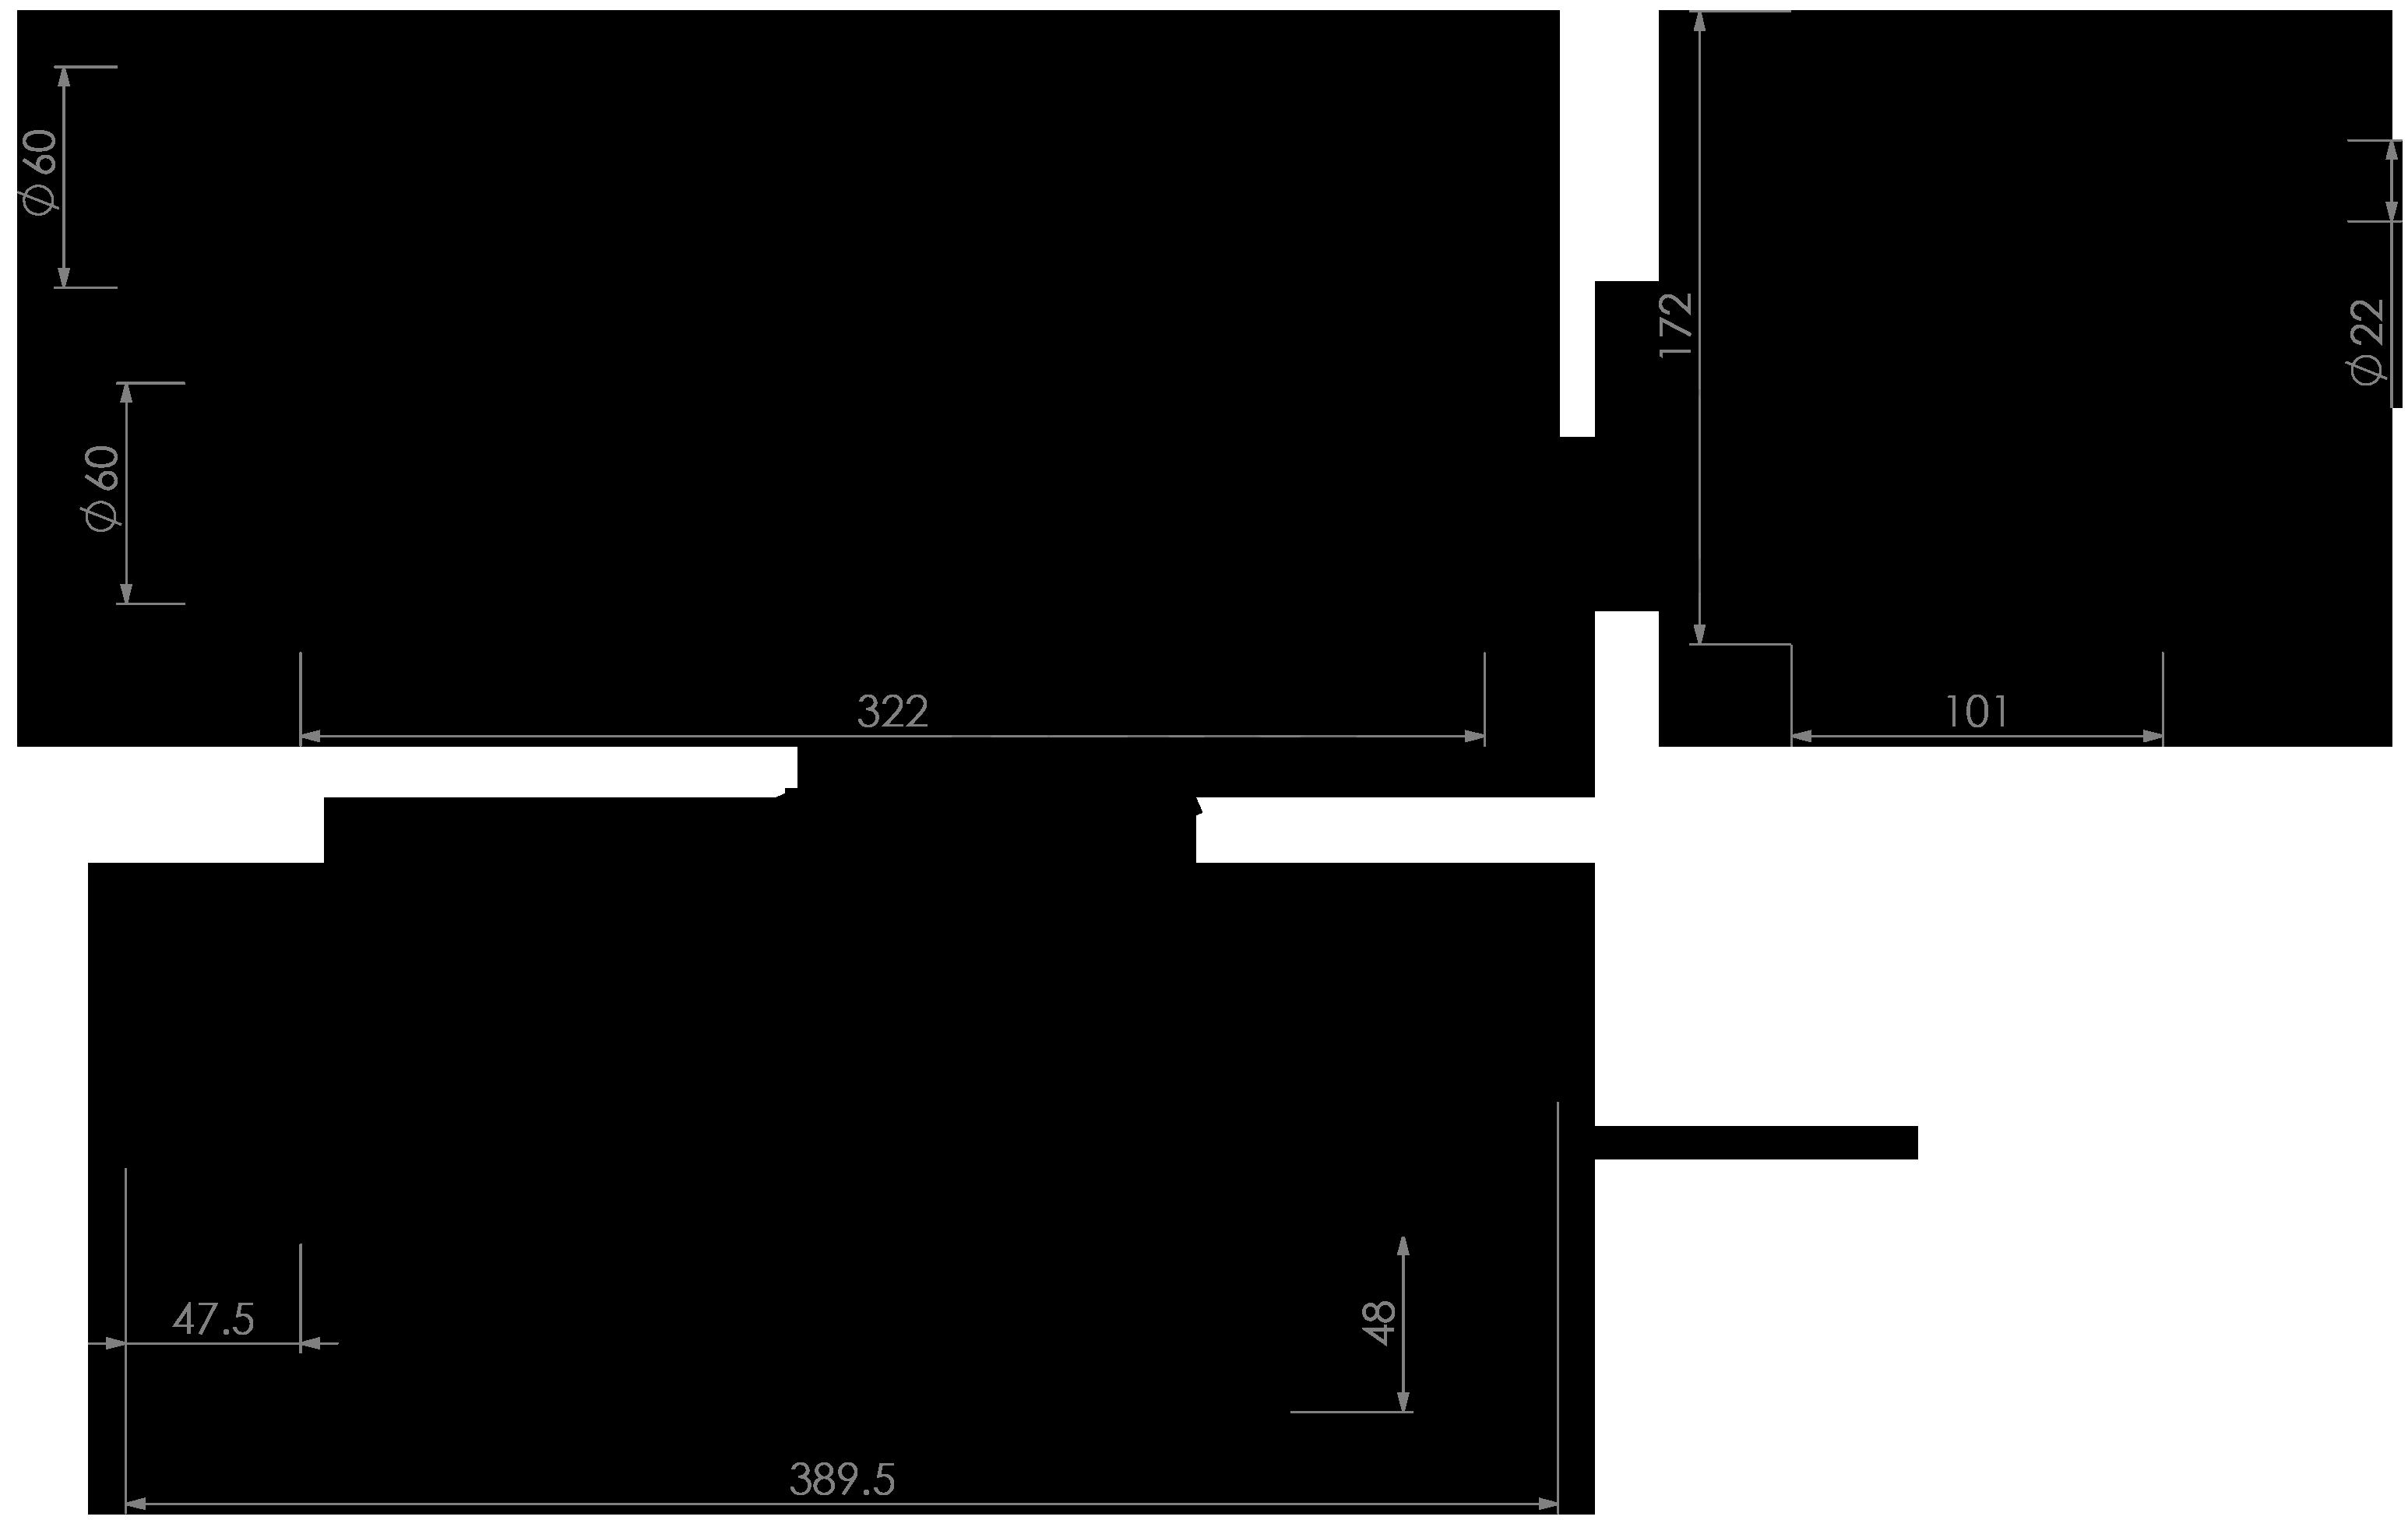 Propex Heatsource HS2000 Dimensions